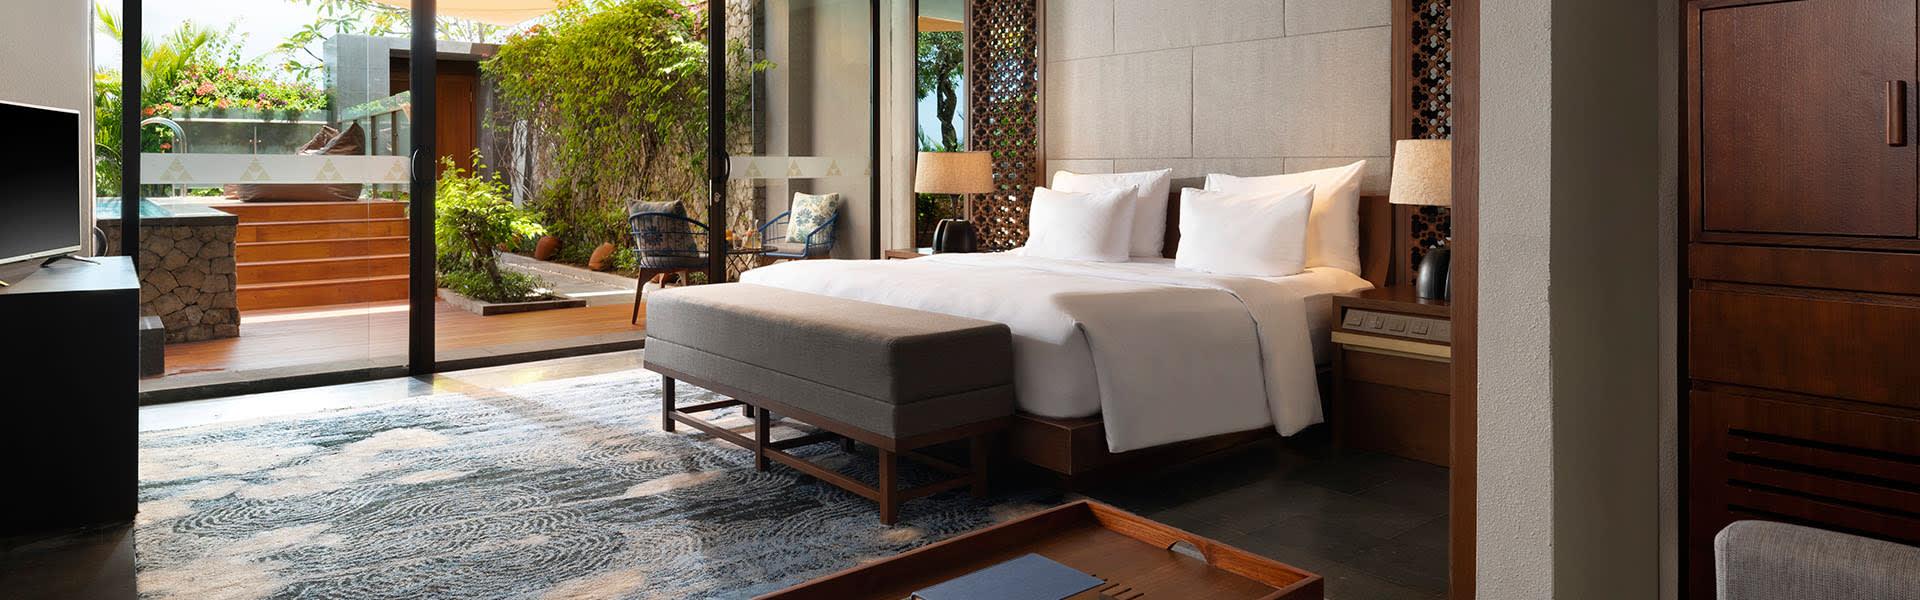 Best Pool Villas In Bali Anantara Uluwatu Bali Ocean View Villa